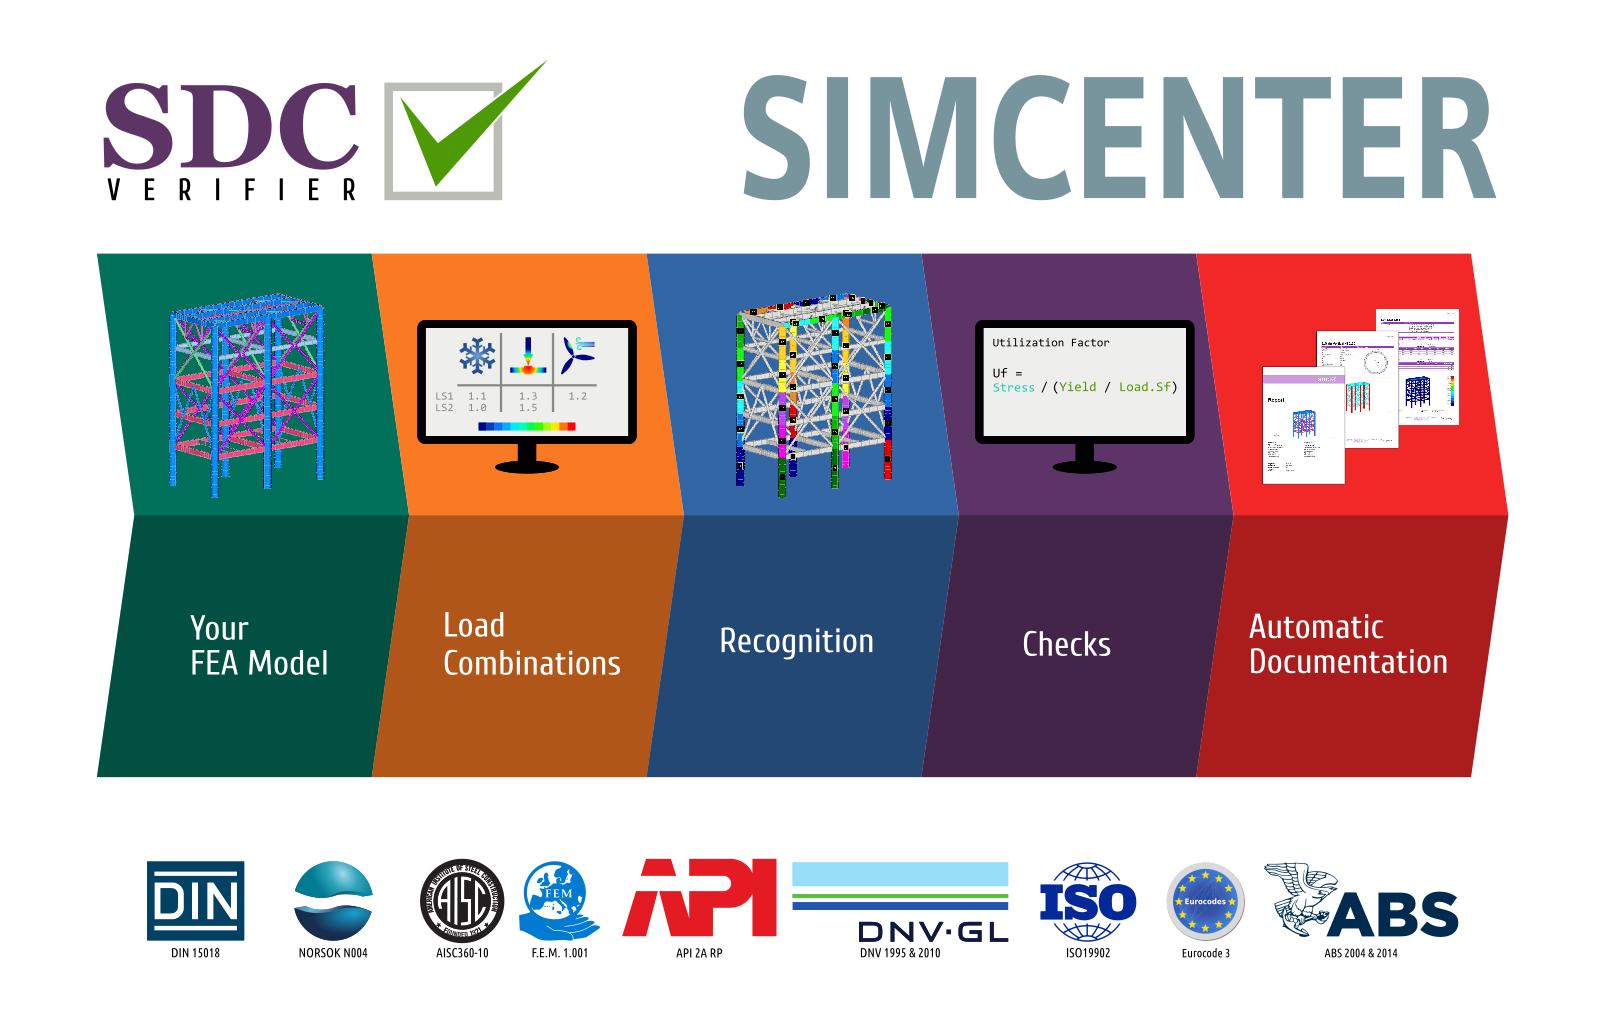 sdc verifier for simcenter